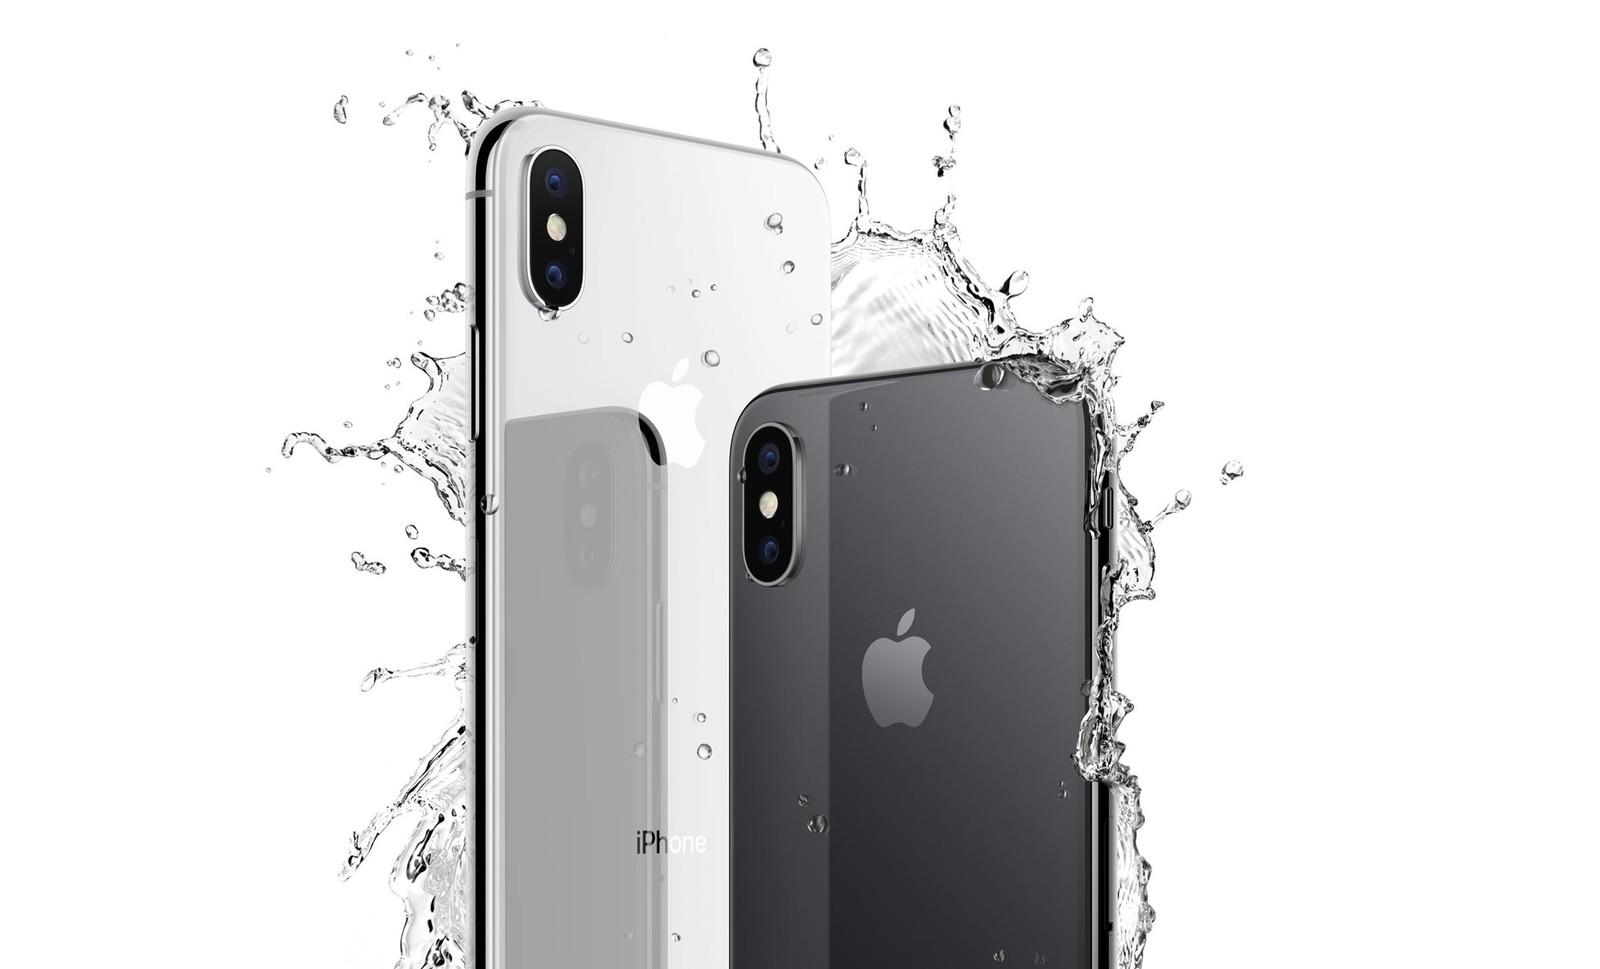 5c2da240f592e2 Best Waterproof Cases for iPhone X in 2019 | iMore